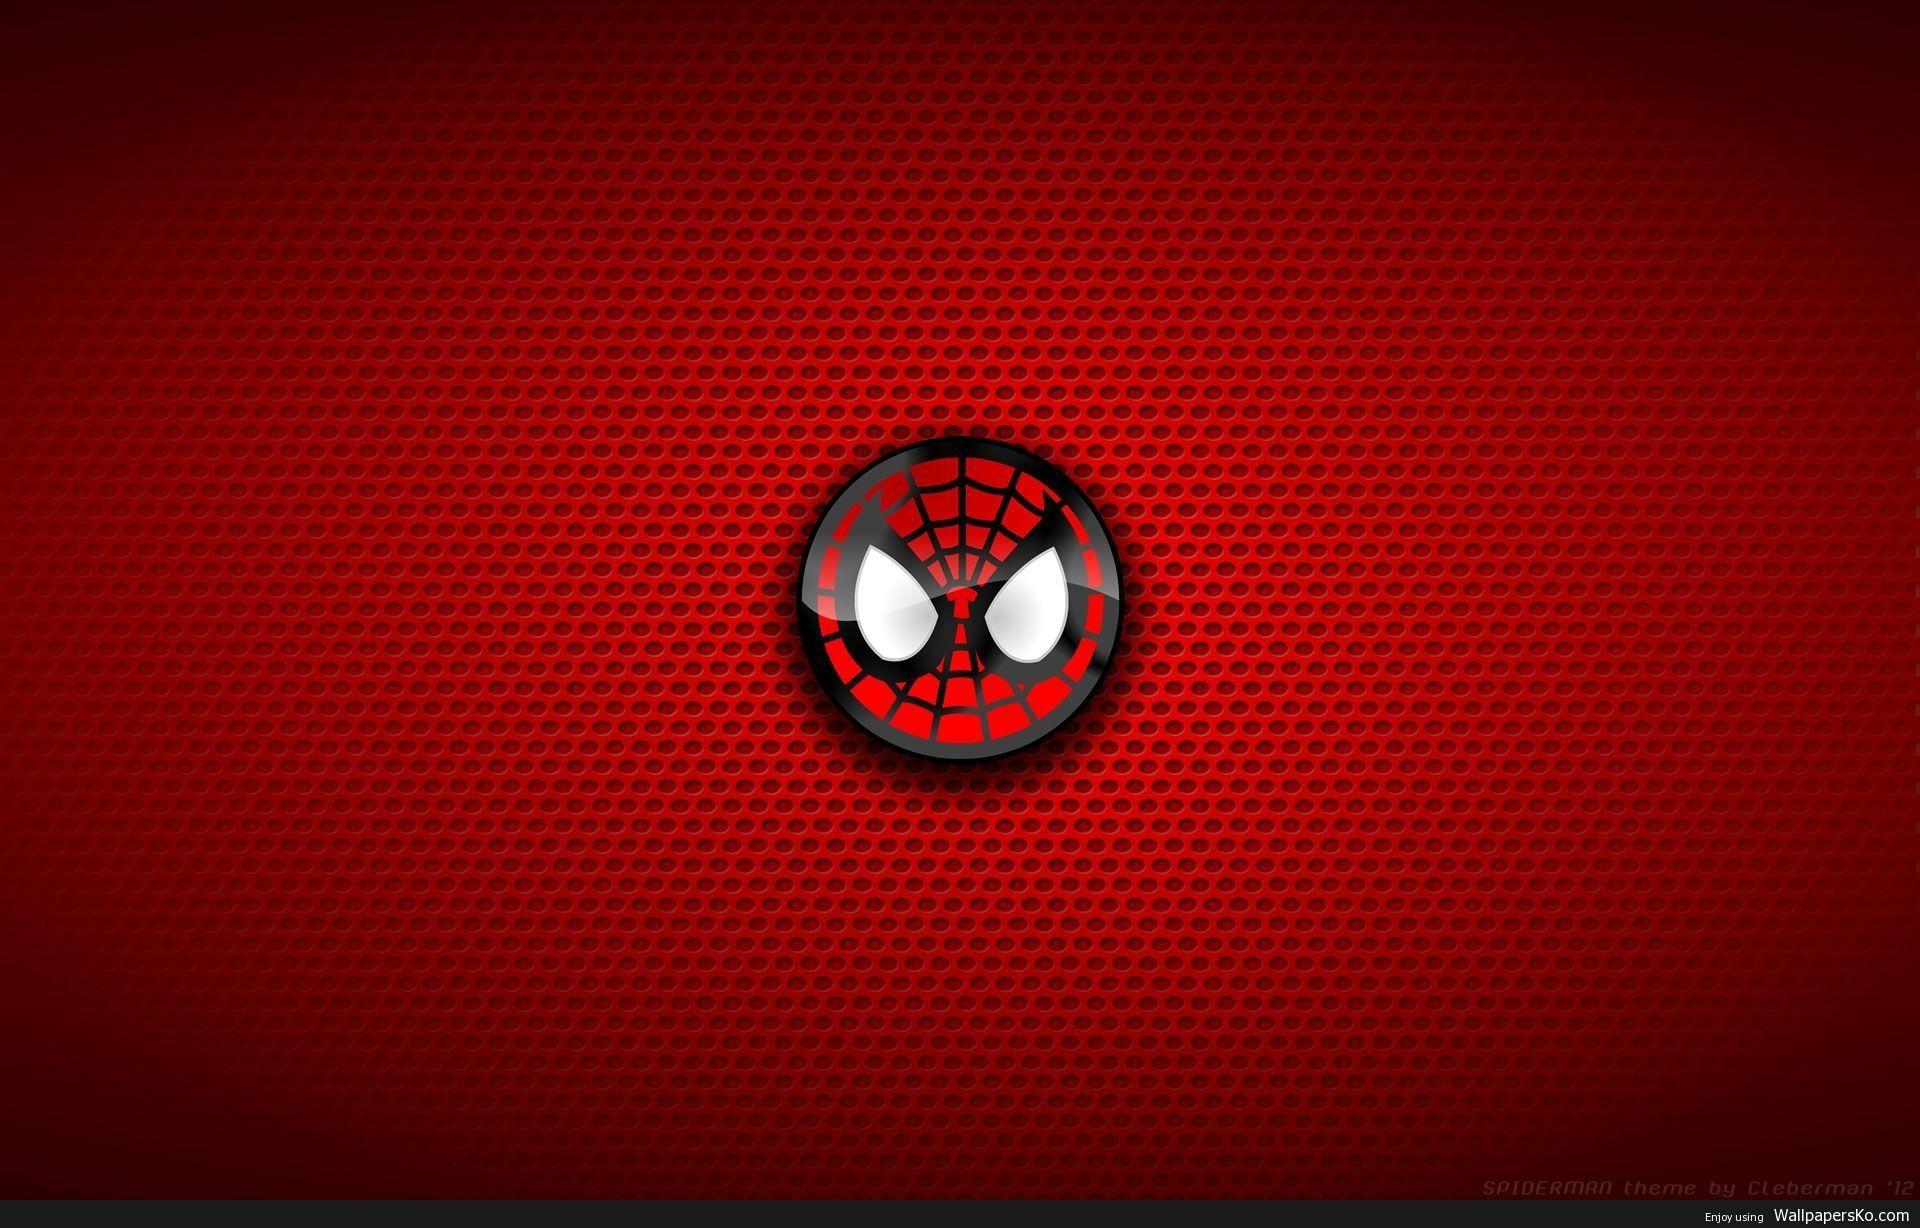 Spiderman Logo Background Http Wallpapersko Com Spiderman Logo Background Html Hd Wallpapers Download Spiderman Pictures Spider Man Wallpaper Spiderman